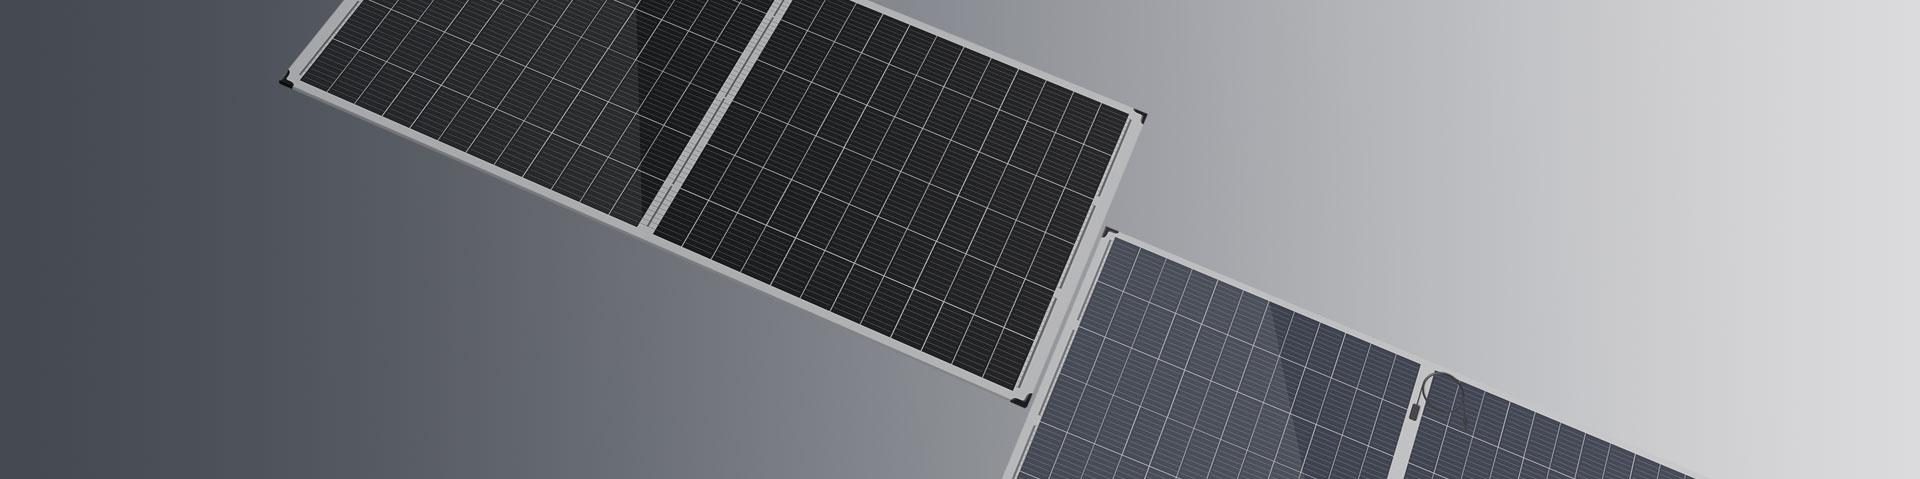 Blade Bifacial Series Seraphim Solar Panel